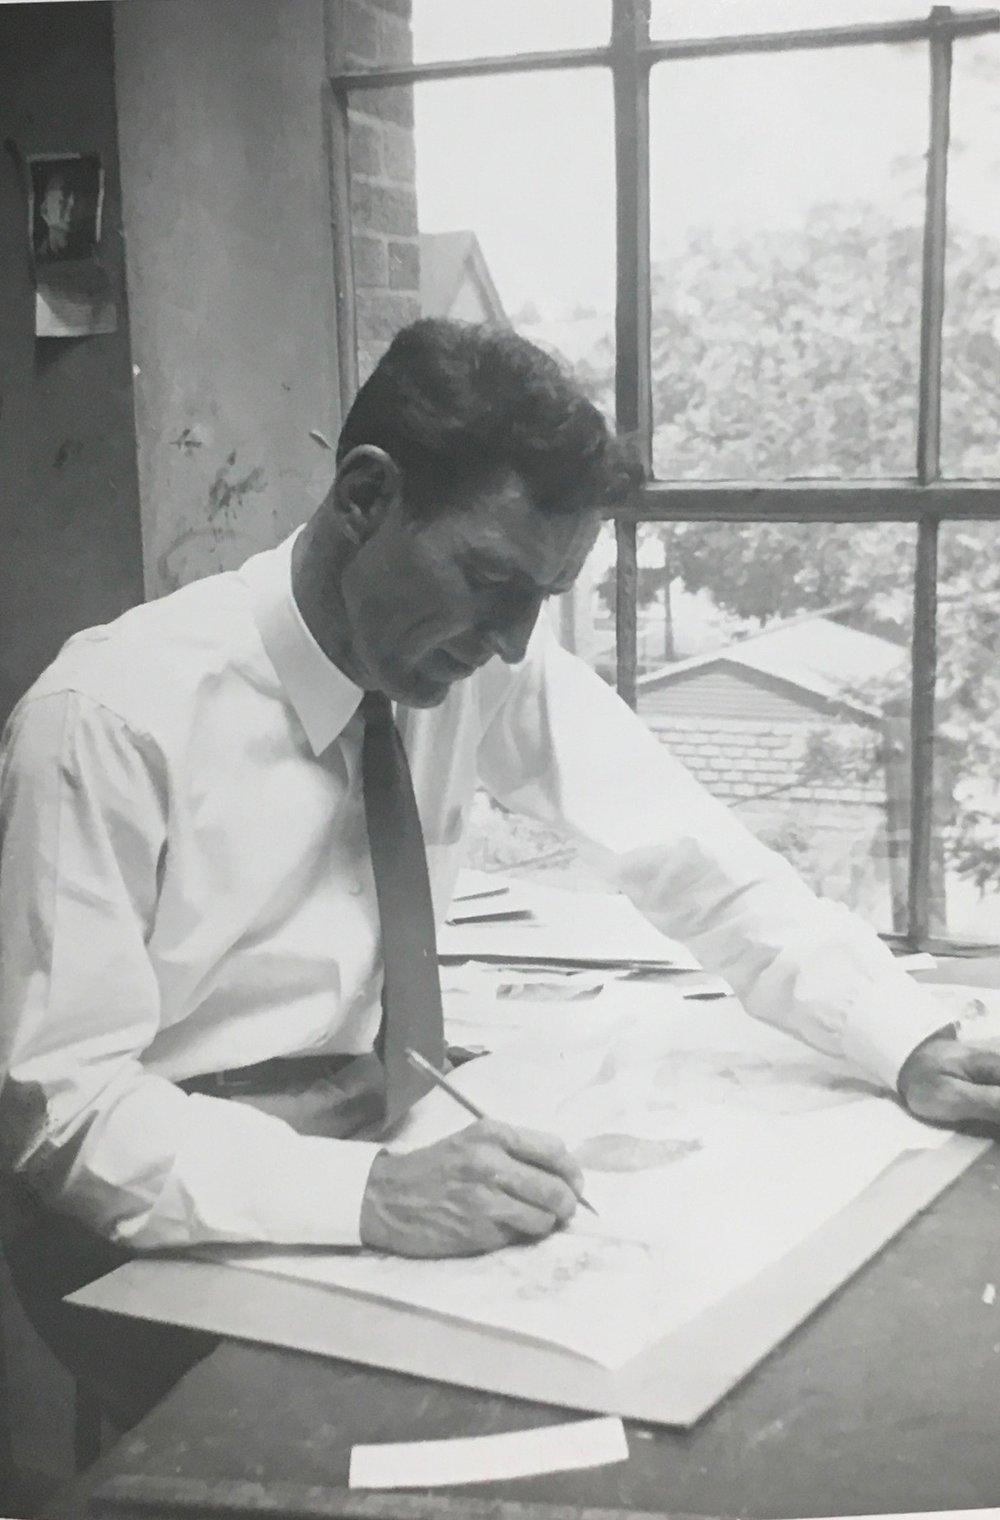 REW instructing at John Herron, 1955